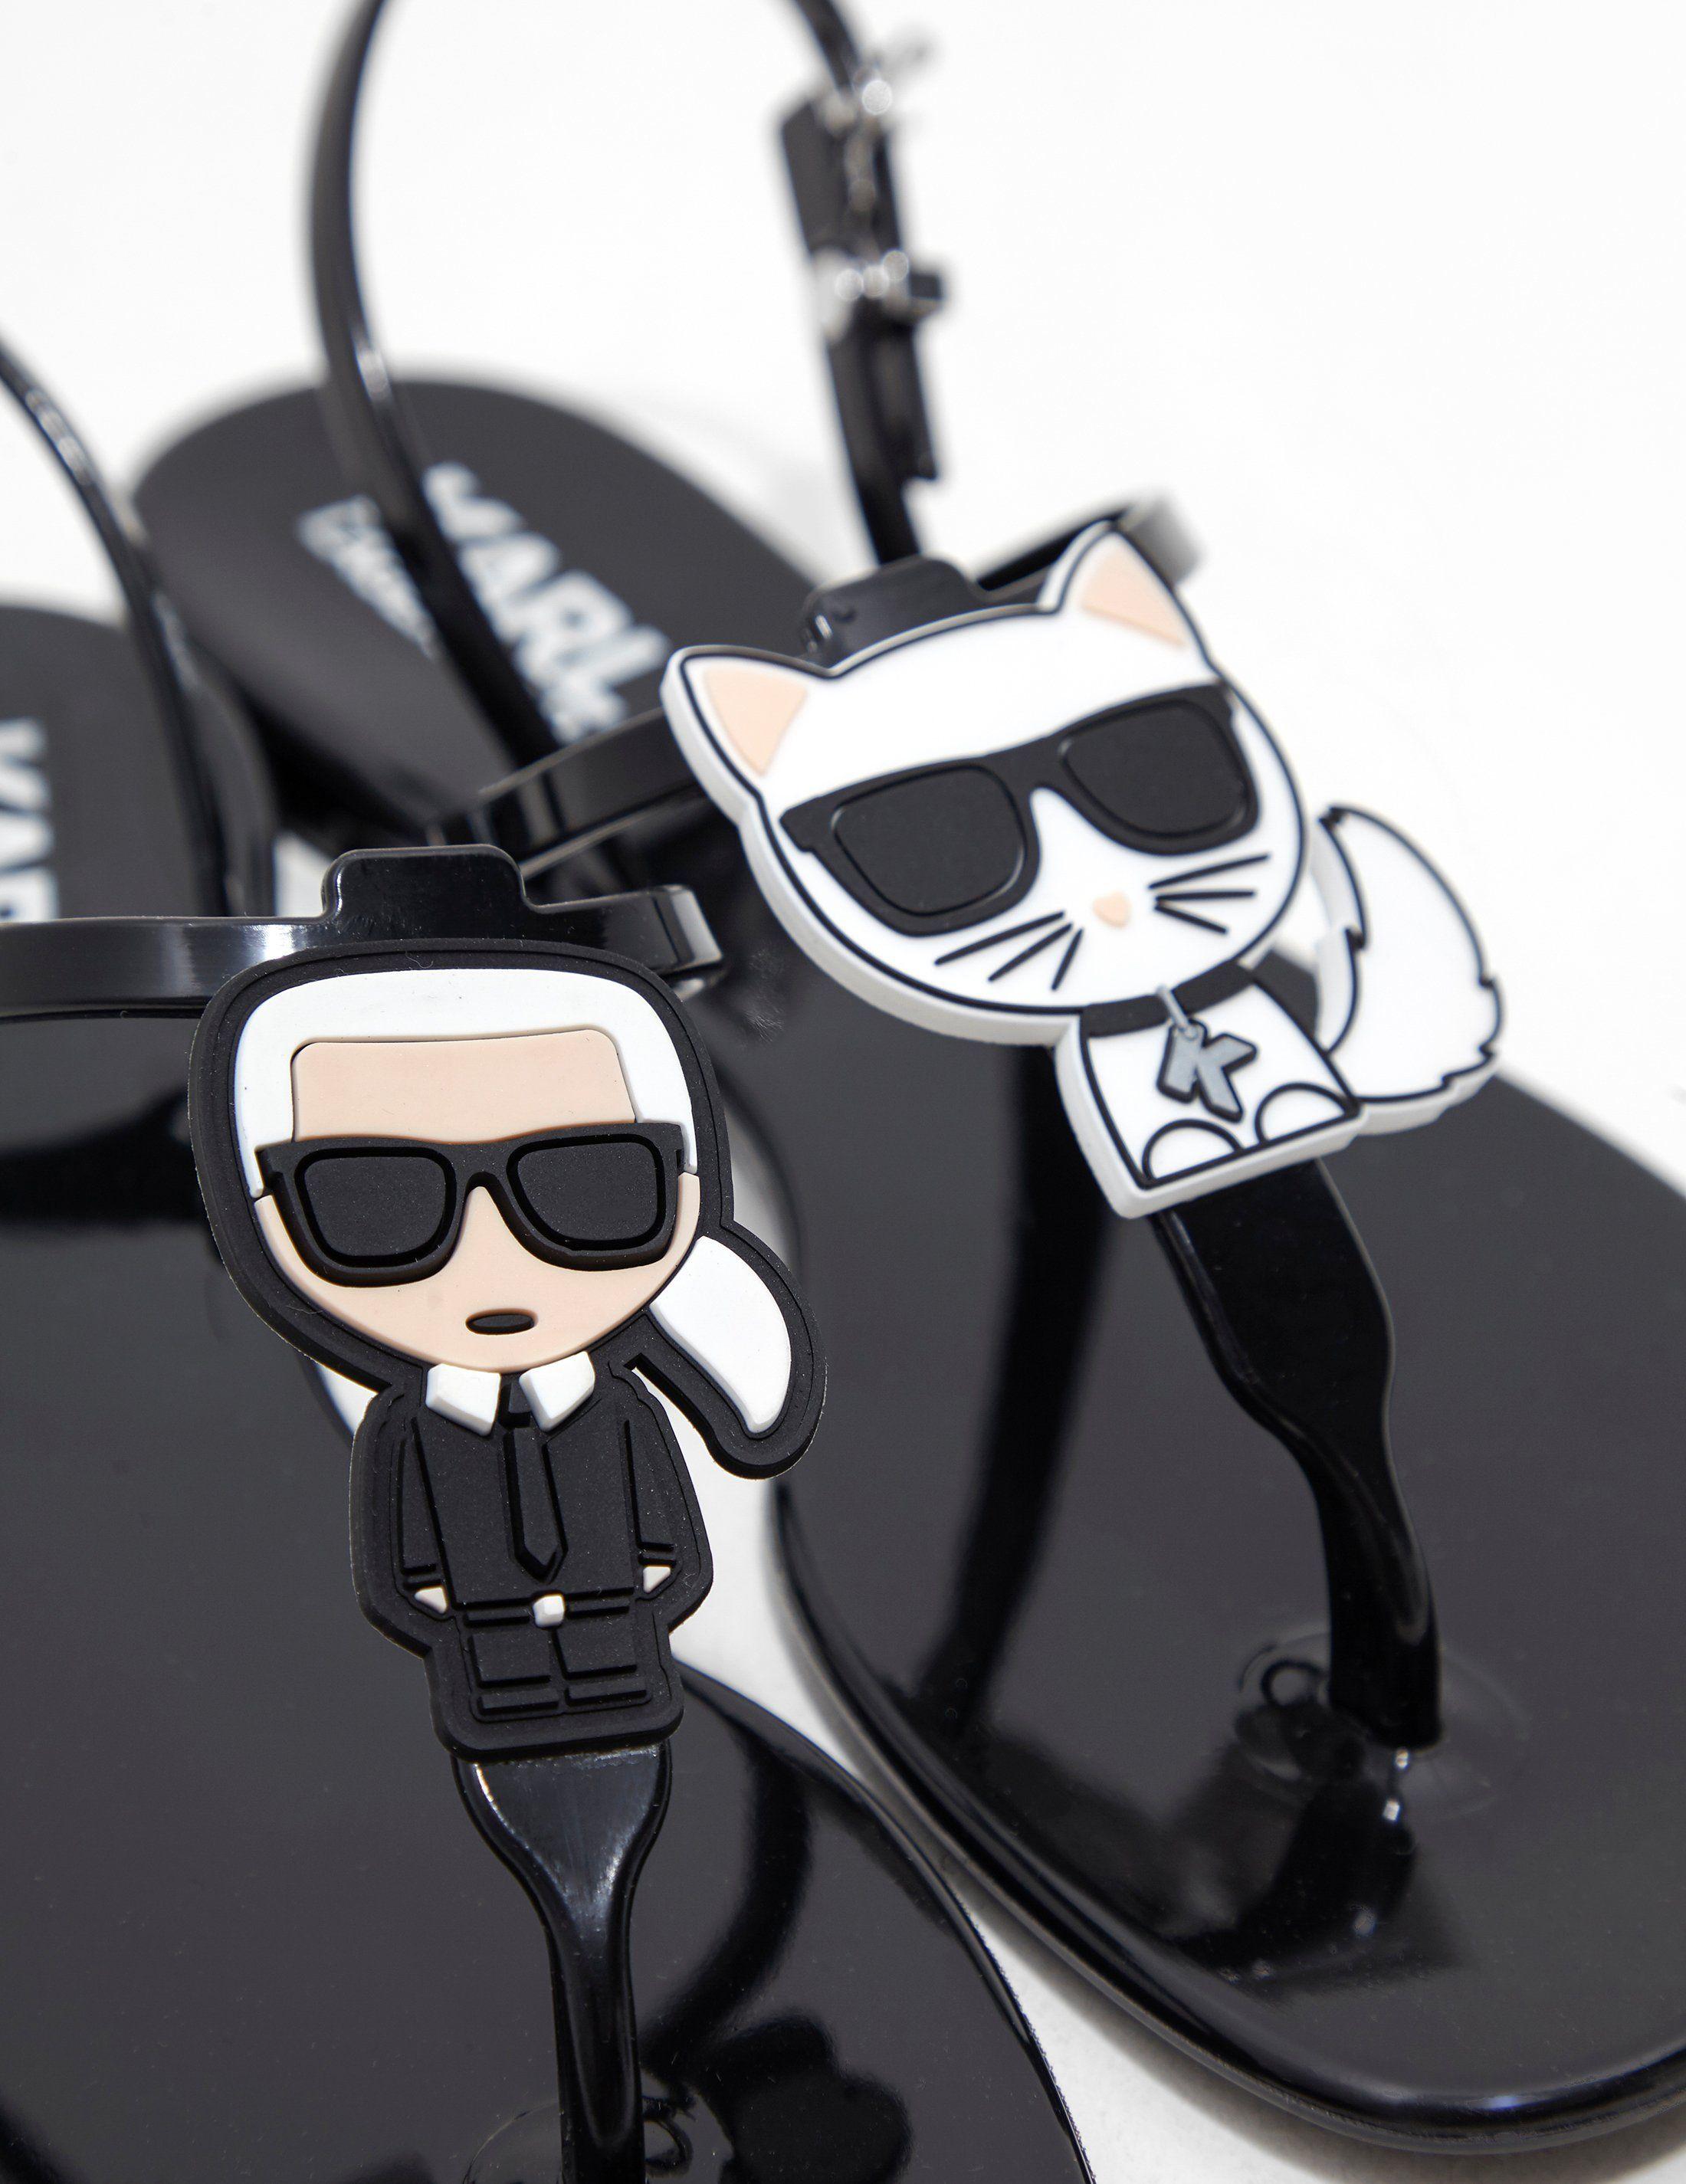 Karl Lagerfeld Jelly Sandals